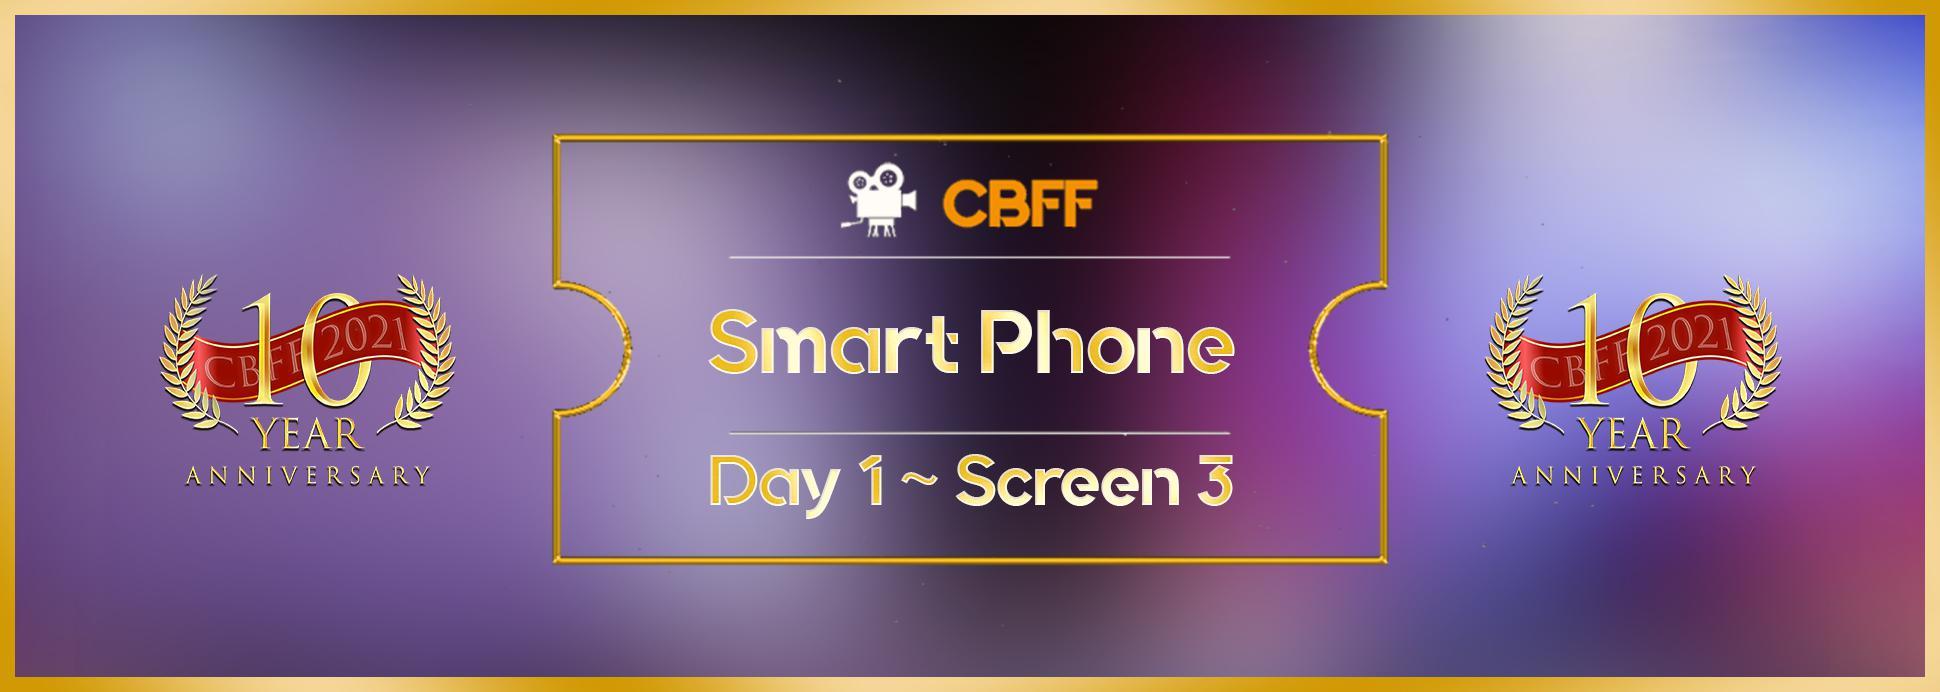 Day 1, Screen 3: Smart Phone